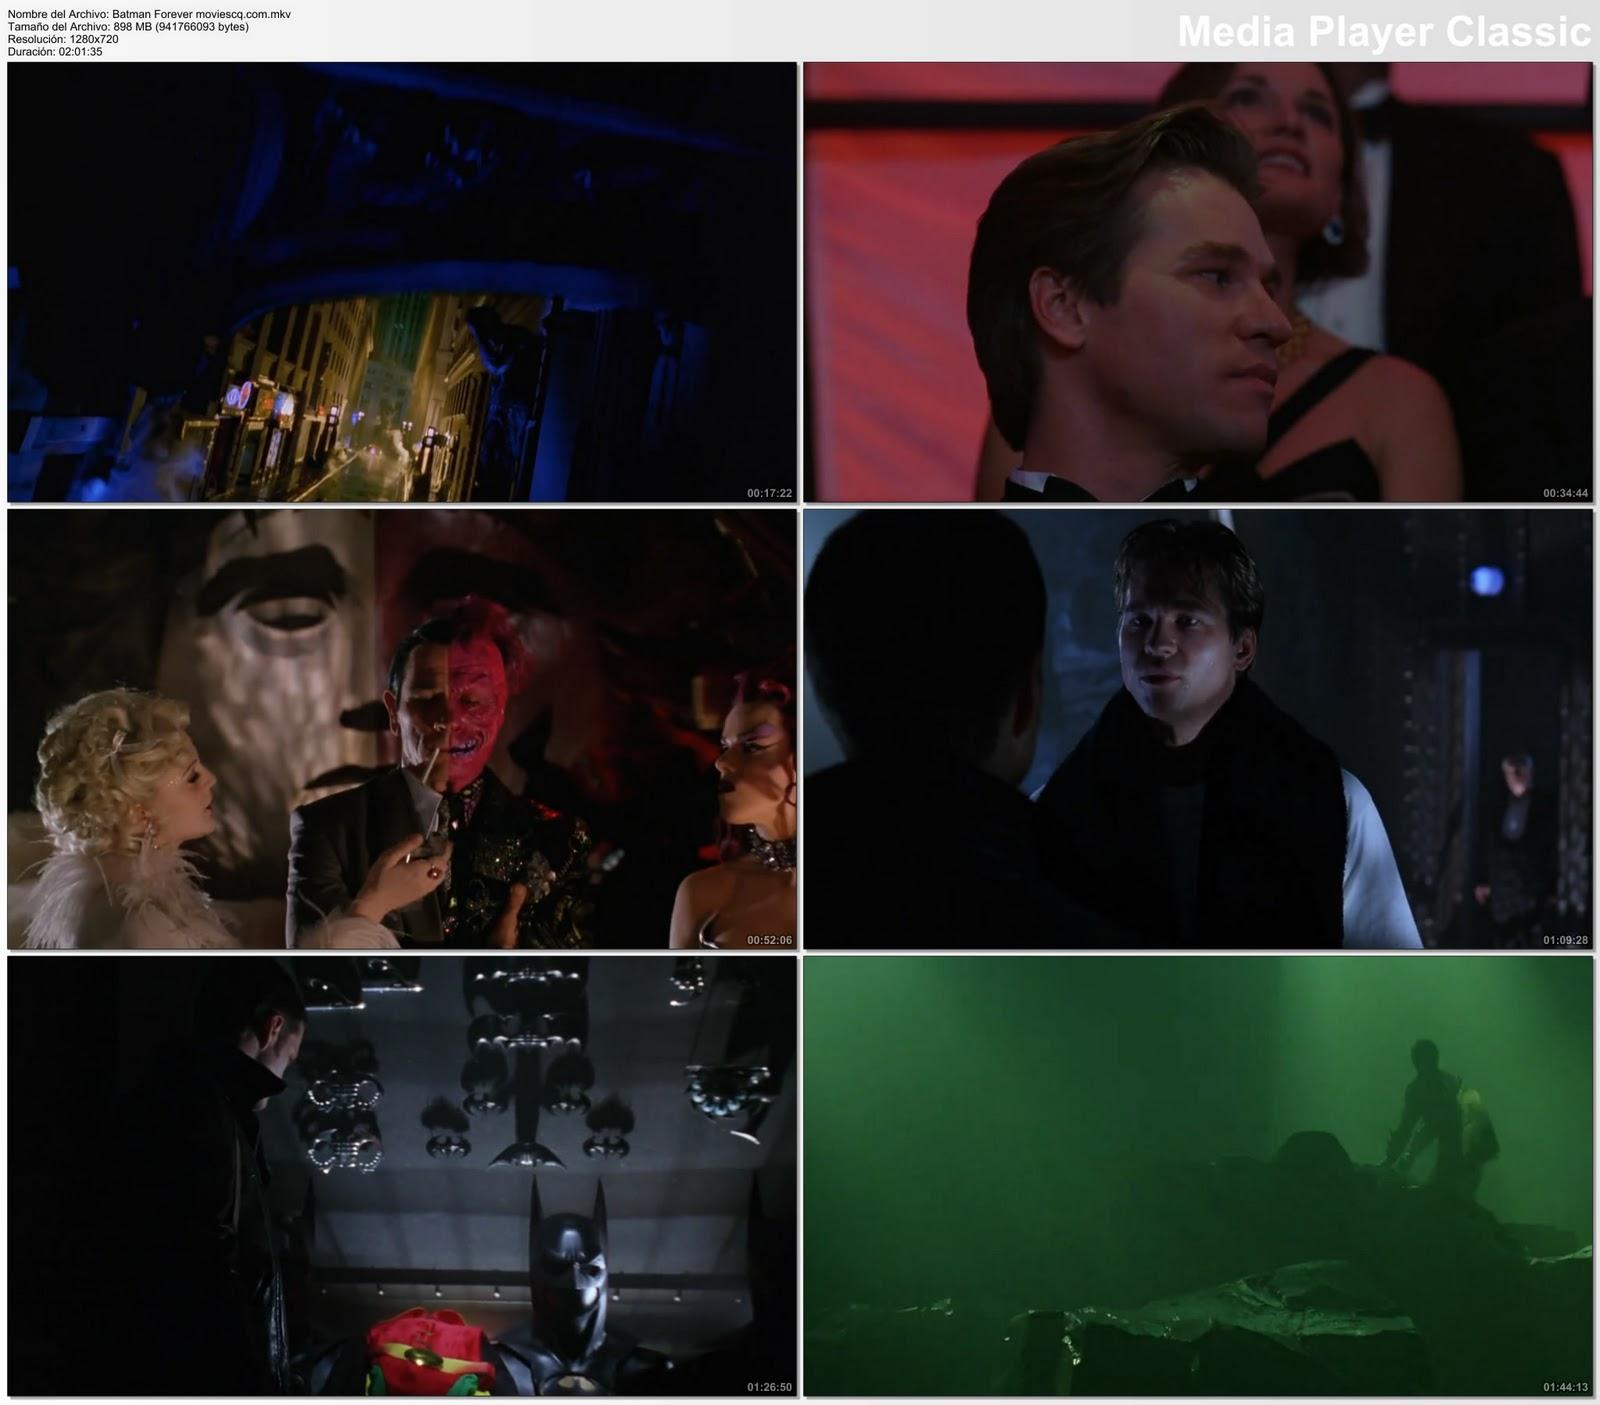 http://1.bp.blogspot.com/-wMBaQ9oGs7A/TufoFMqflpI/AAAAAAAAAyA/_rxL8q5lues/s1600/Batman+Forever+moviescq.com.mkv_thumbs_%255B2011.12.13_12.11.13%255D.jpg